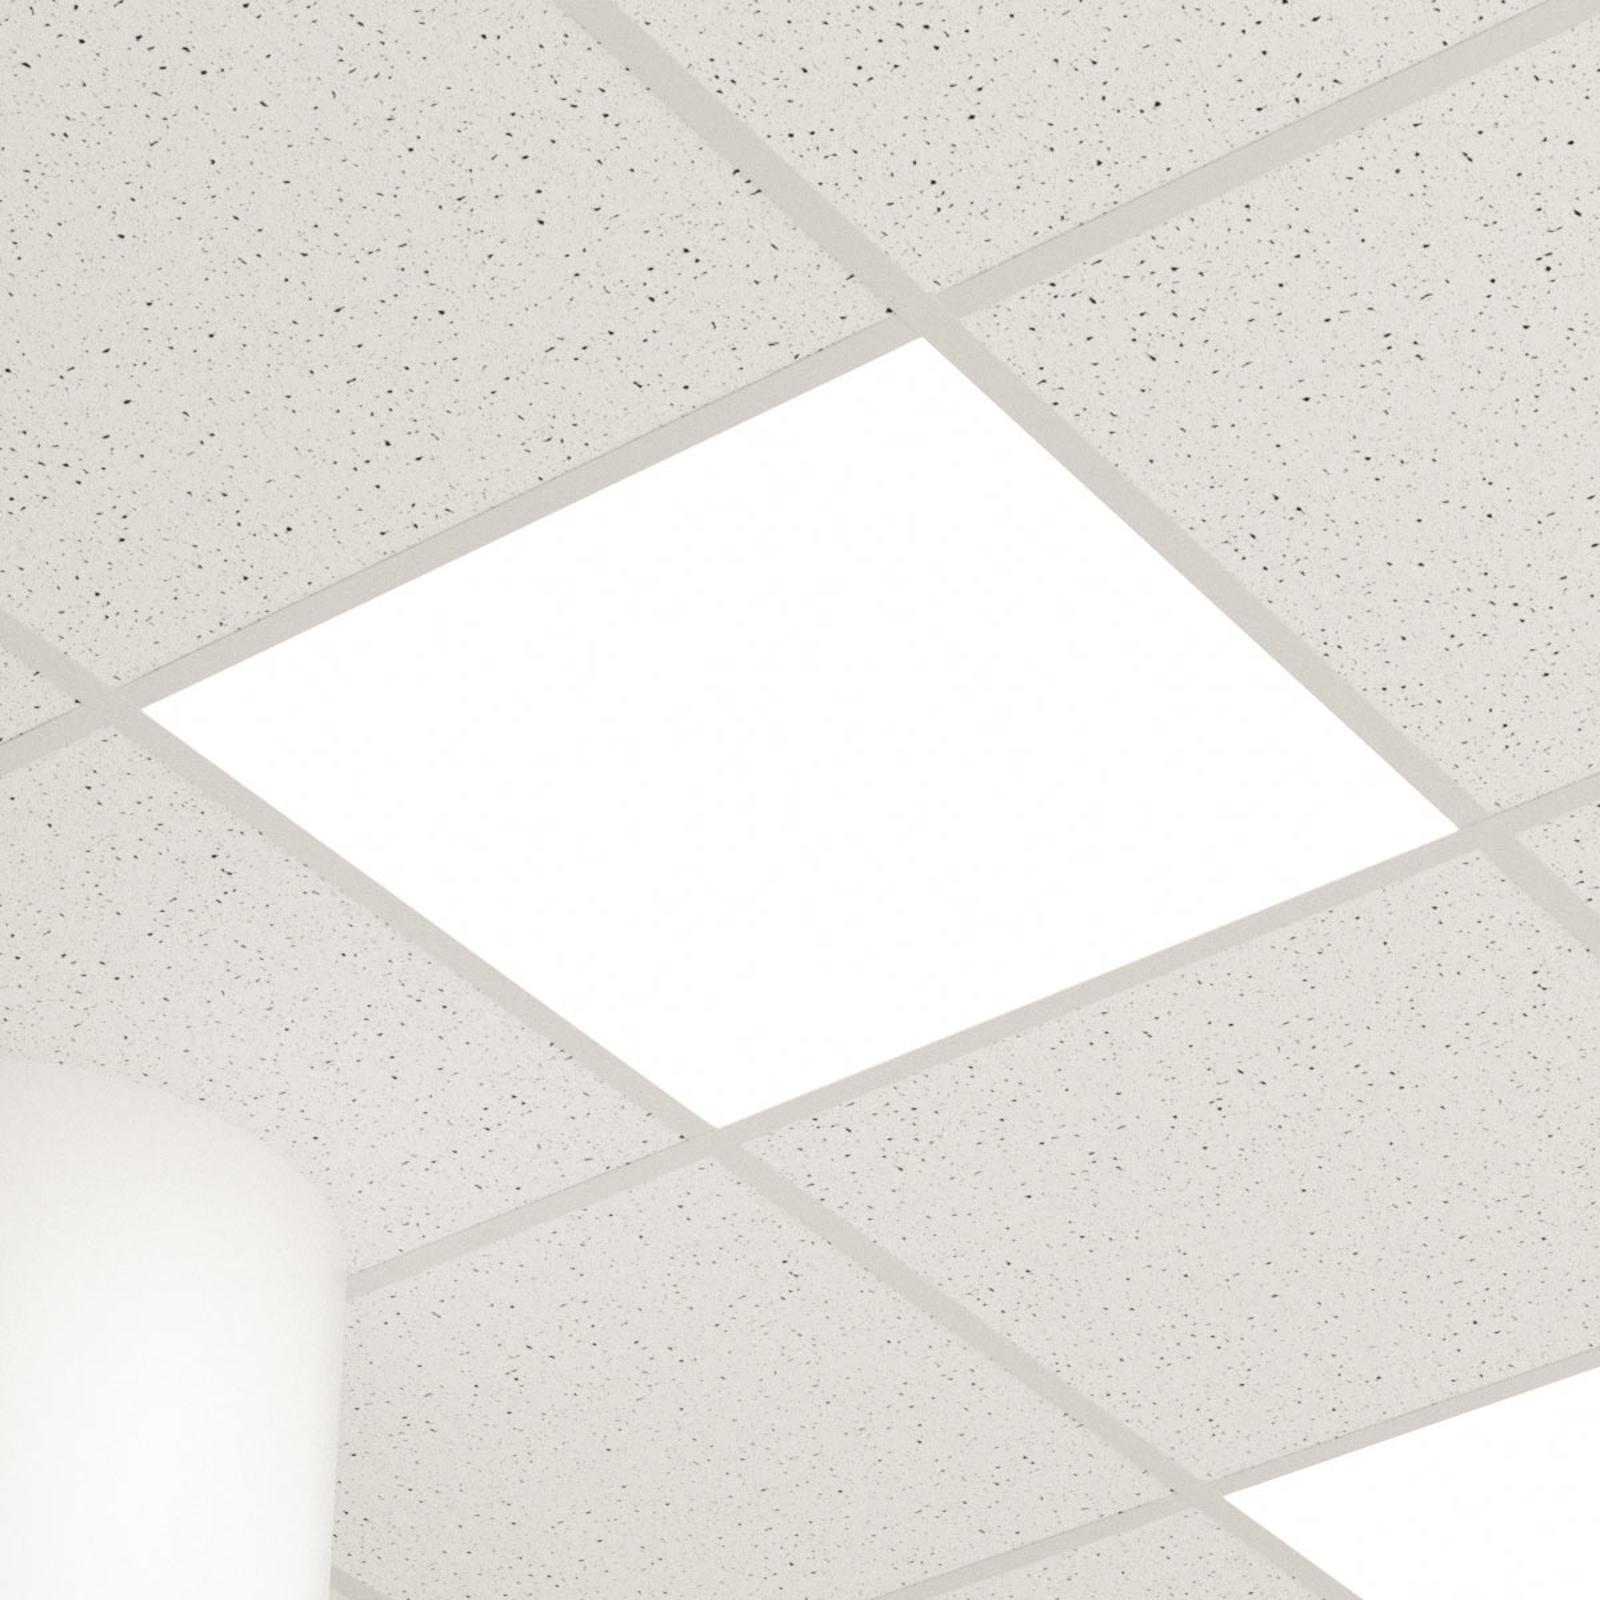 Universalweißes LED-Panel Vinas, 62 cm